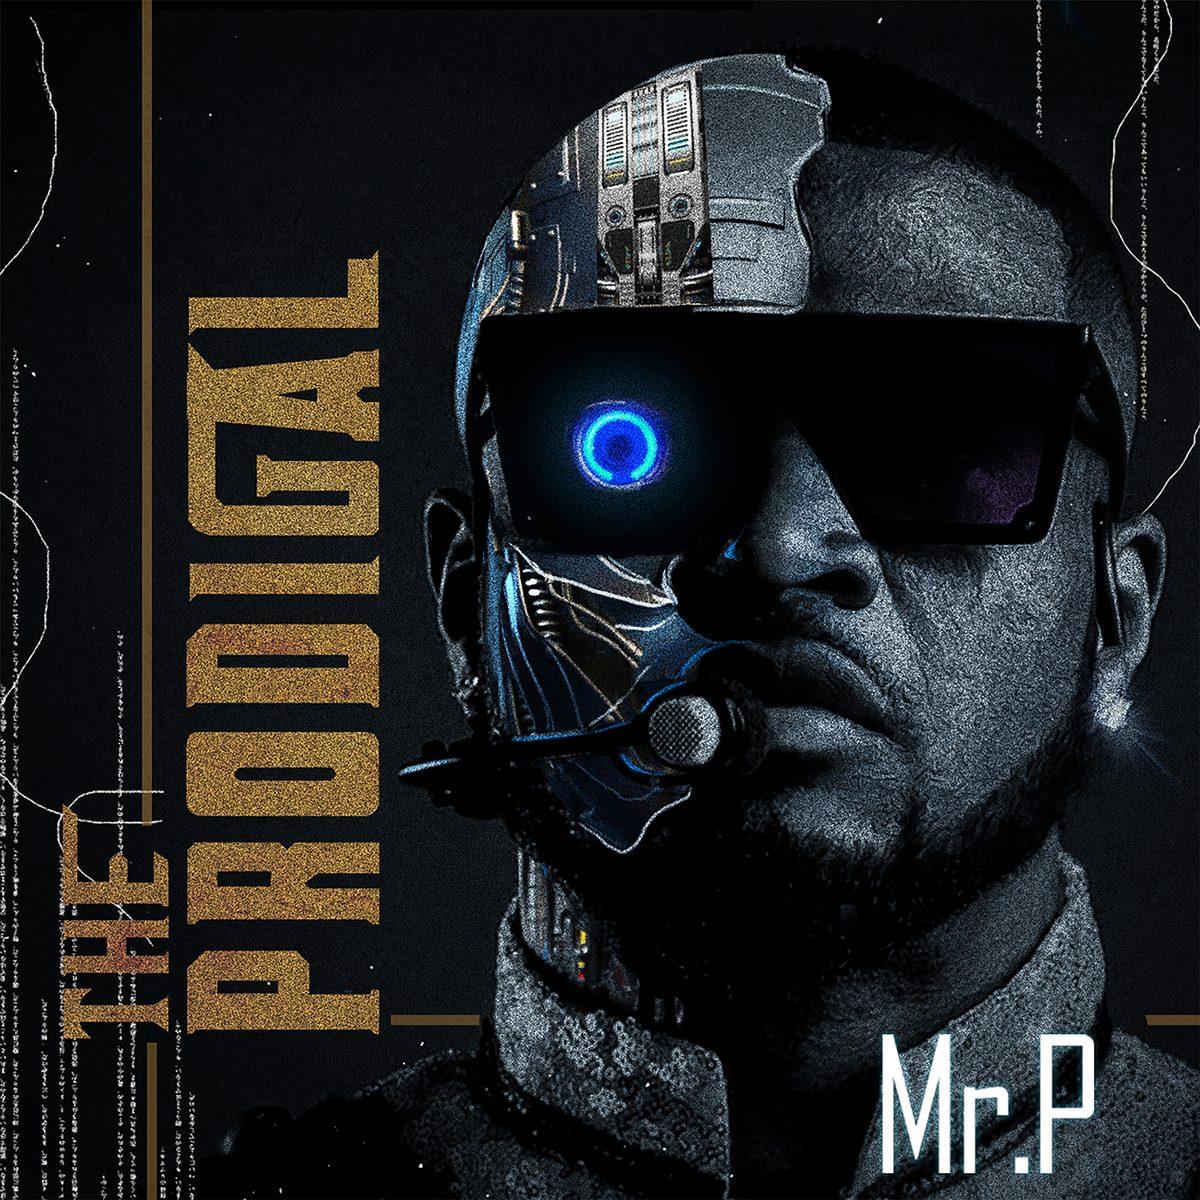 Mr. P - The Prodigal [ALBUM]